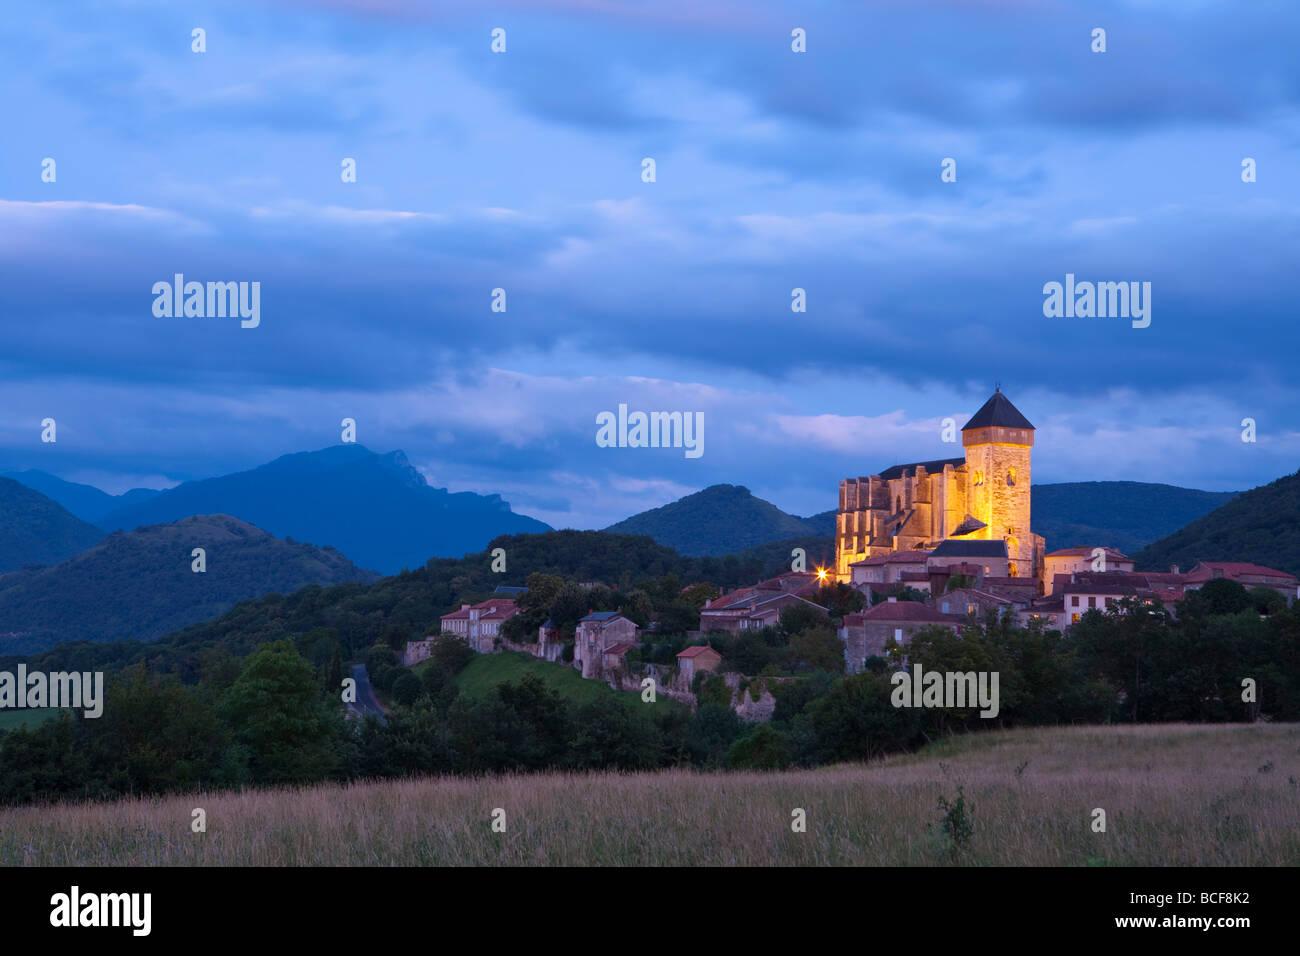 St Bertrand De Comminges, Haute-Garonne, Midi-Pyrenees, France - Stock Image